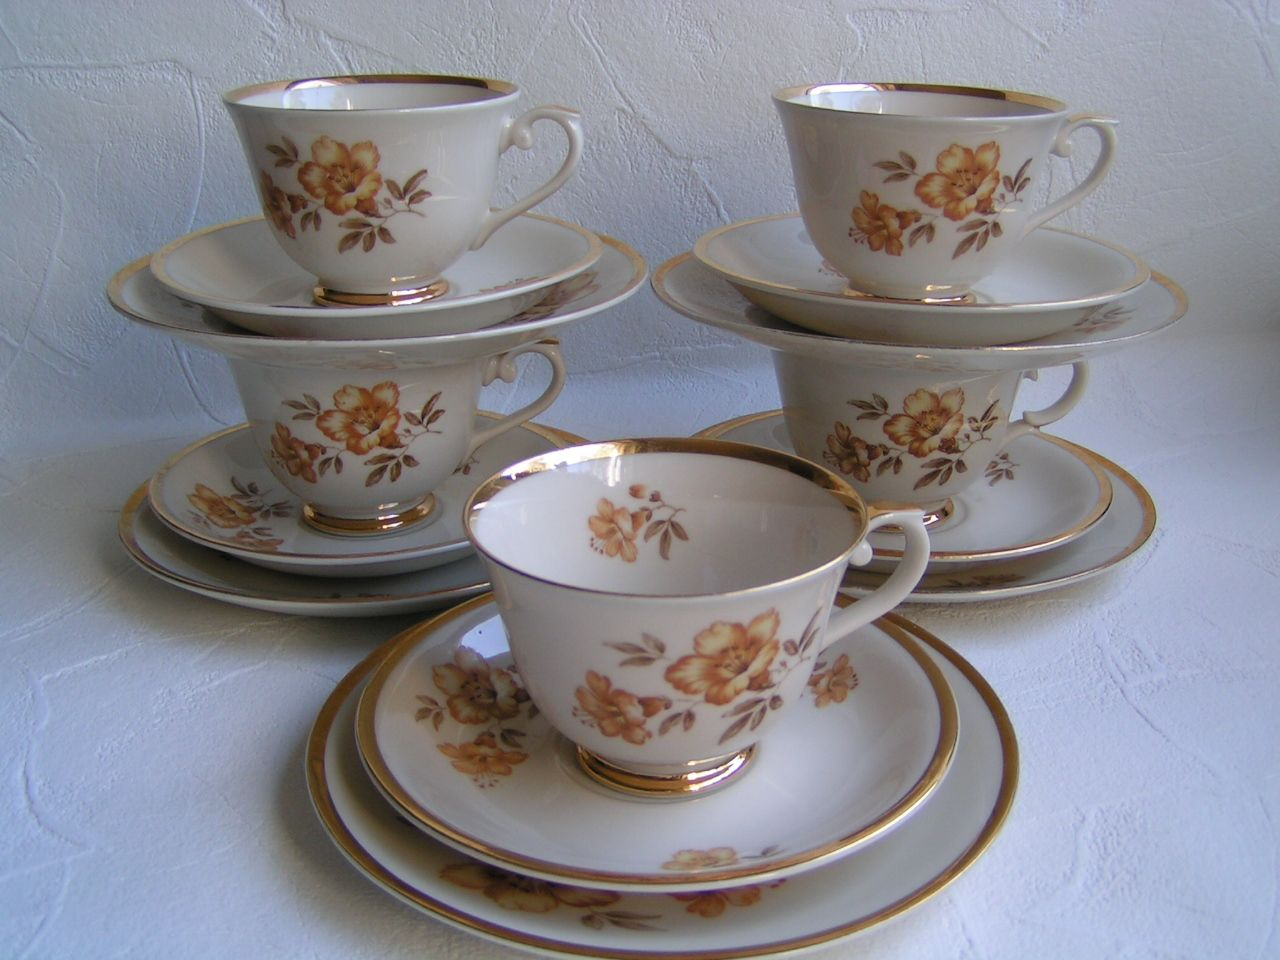 Myrna kahvikupit 6 kpl   Purppura-Antiikki